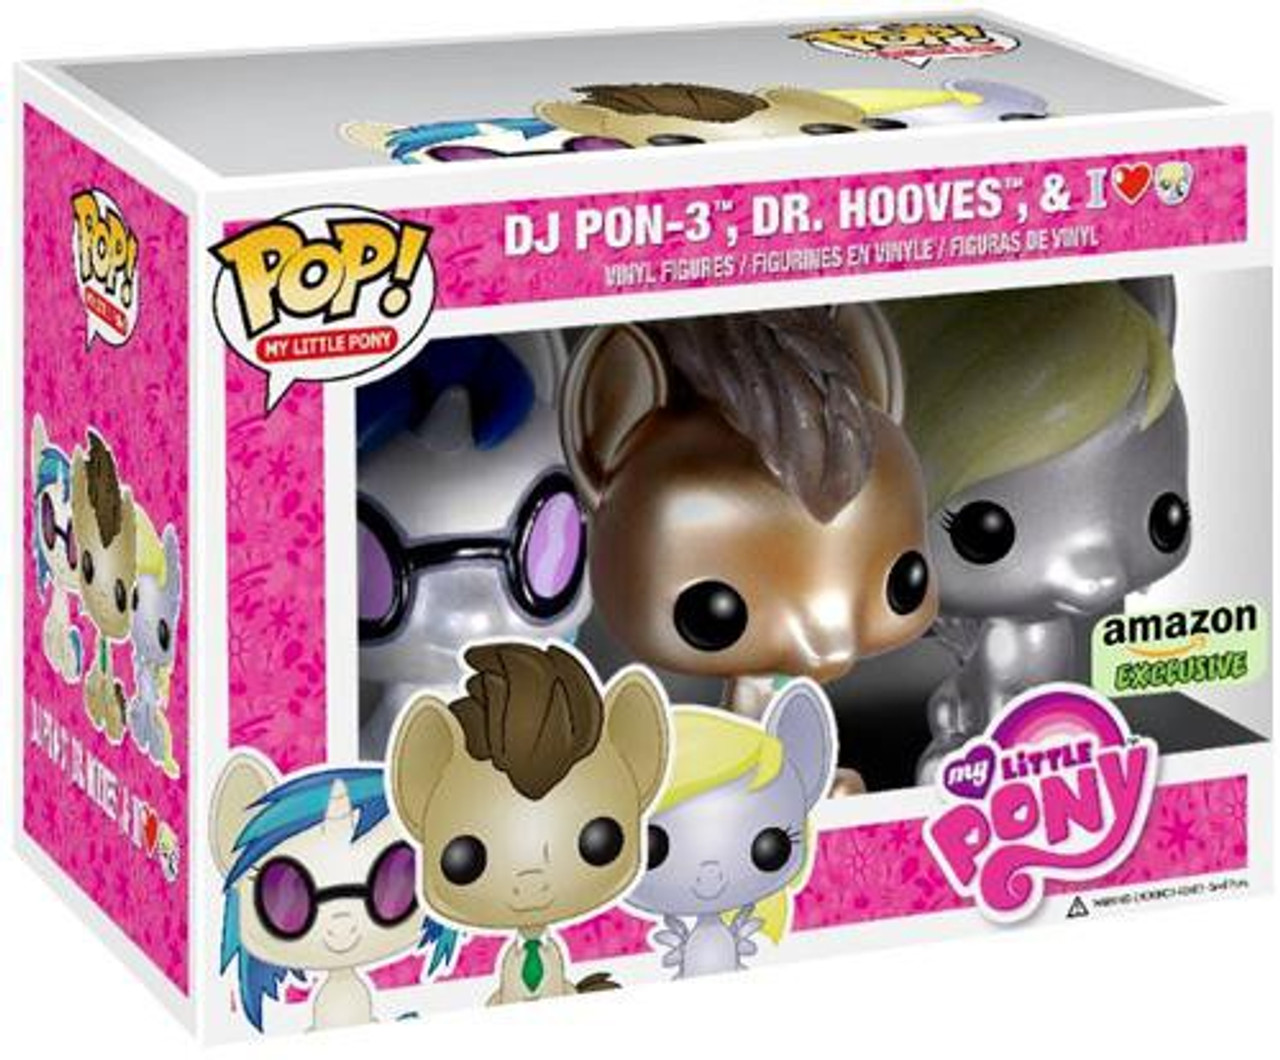 Funko POP! My Little Pony DJ PON-3, Dr. Hooves & Derpy Hooves Exclusive Vinyl Figure 3-Pack